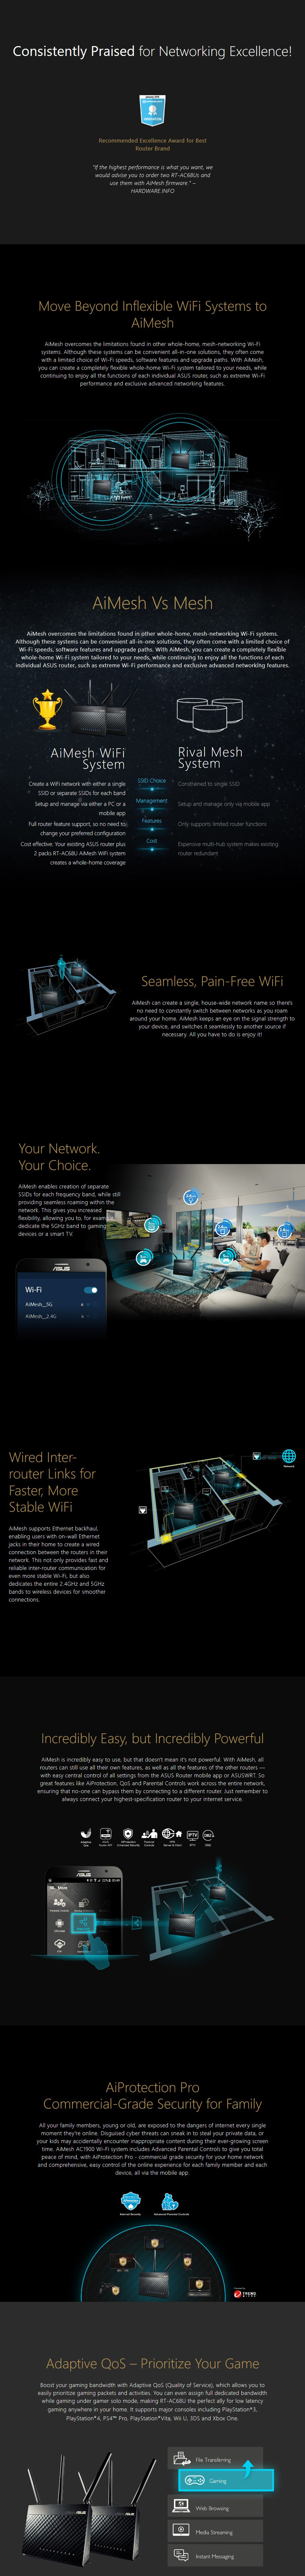 Asus RT-AC68U AiMesh AC1900 Dual Band Wireless GbE Router